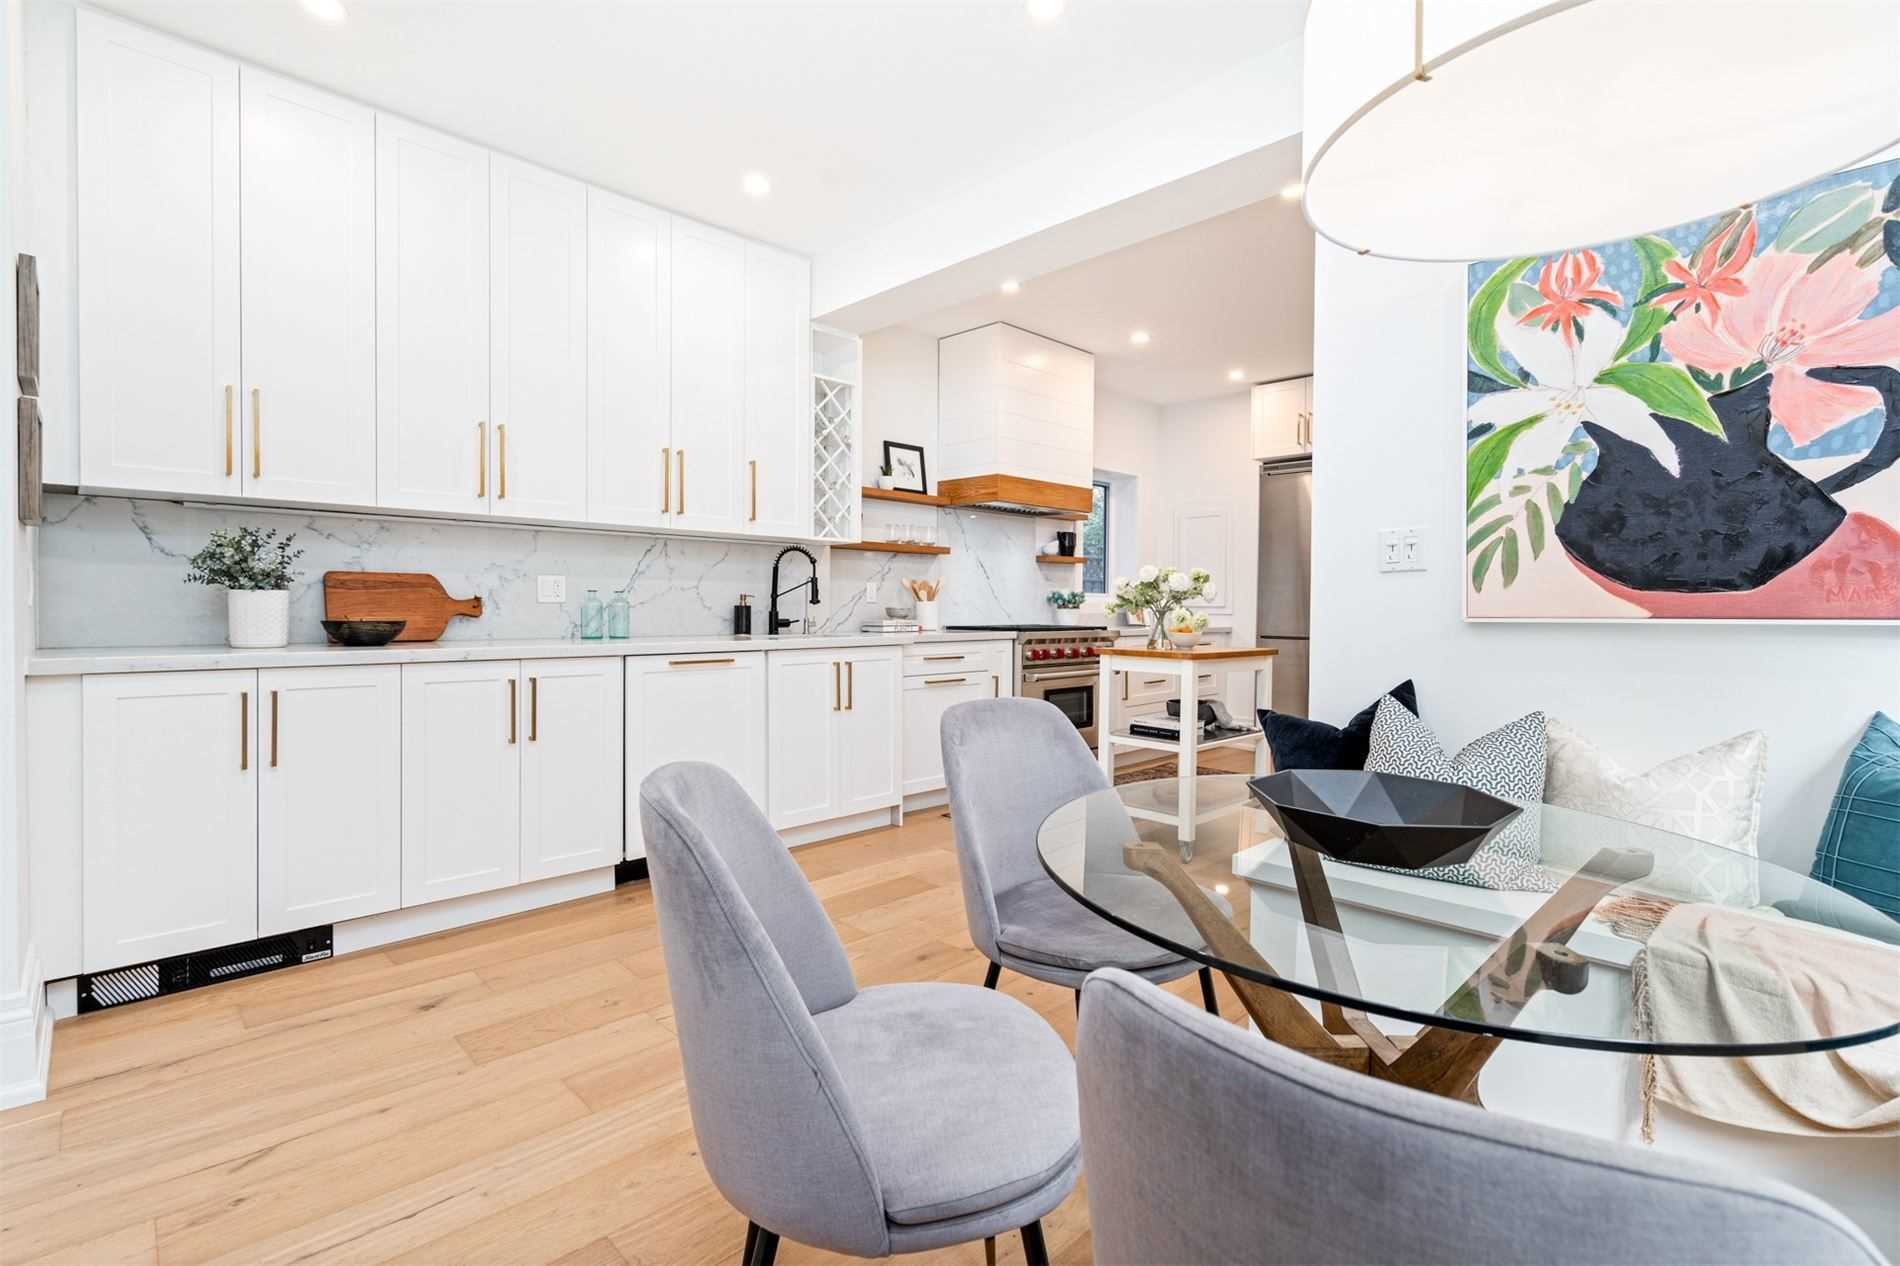 48 Munro Park Ave, Toronto, Ontario M4E3M3, 4 Bedrooms Bedrooms, 8 Rooms Rooms,4 BathroomsBathrooms,Detached,For Sale,Munro Park,E5361611